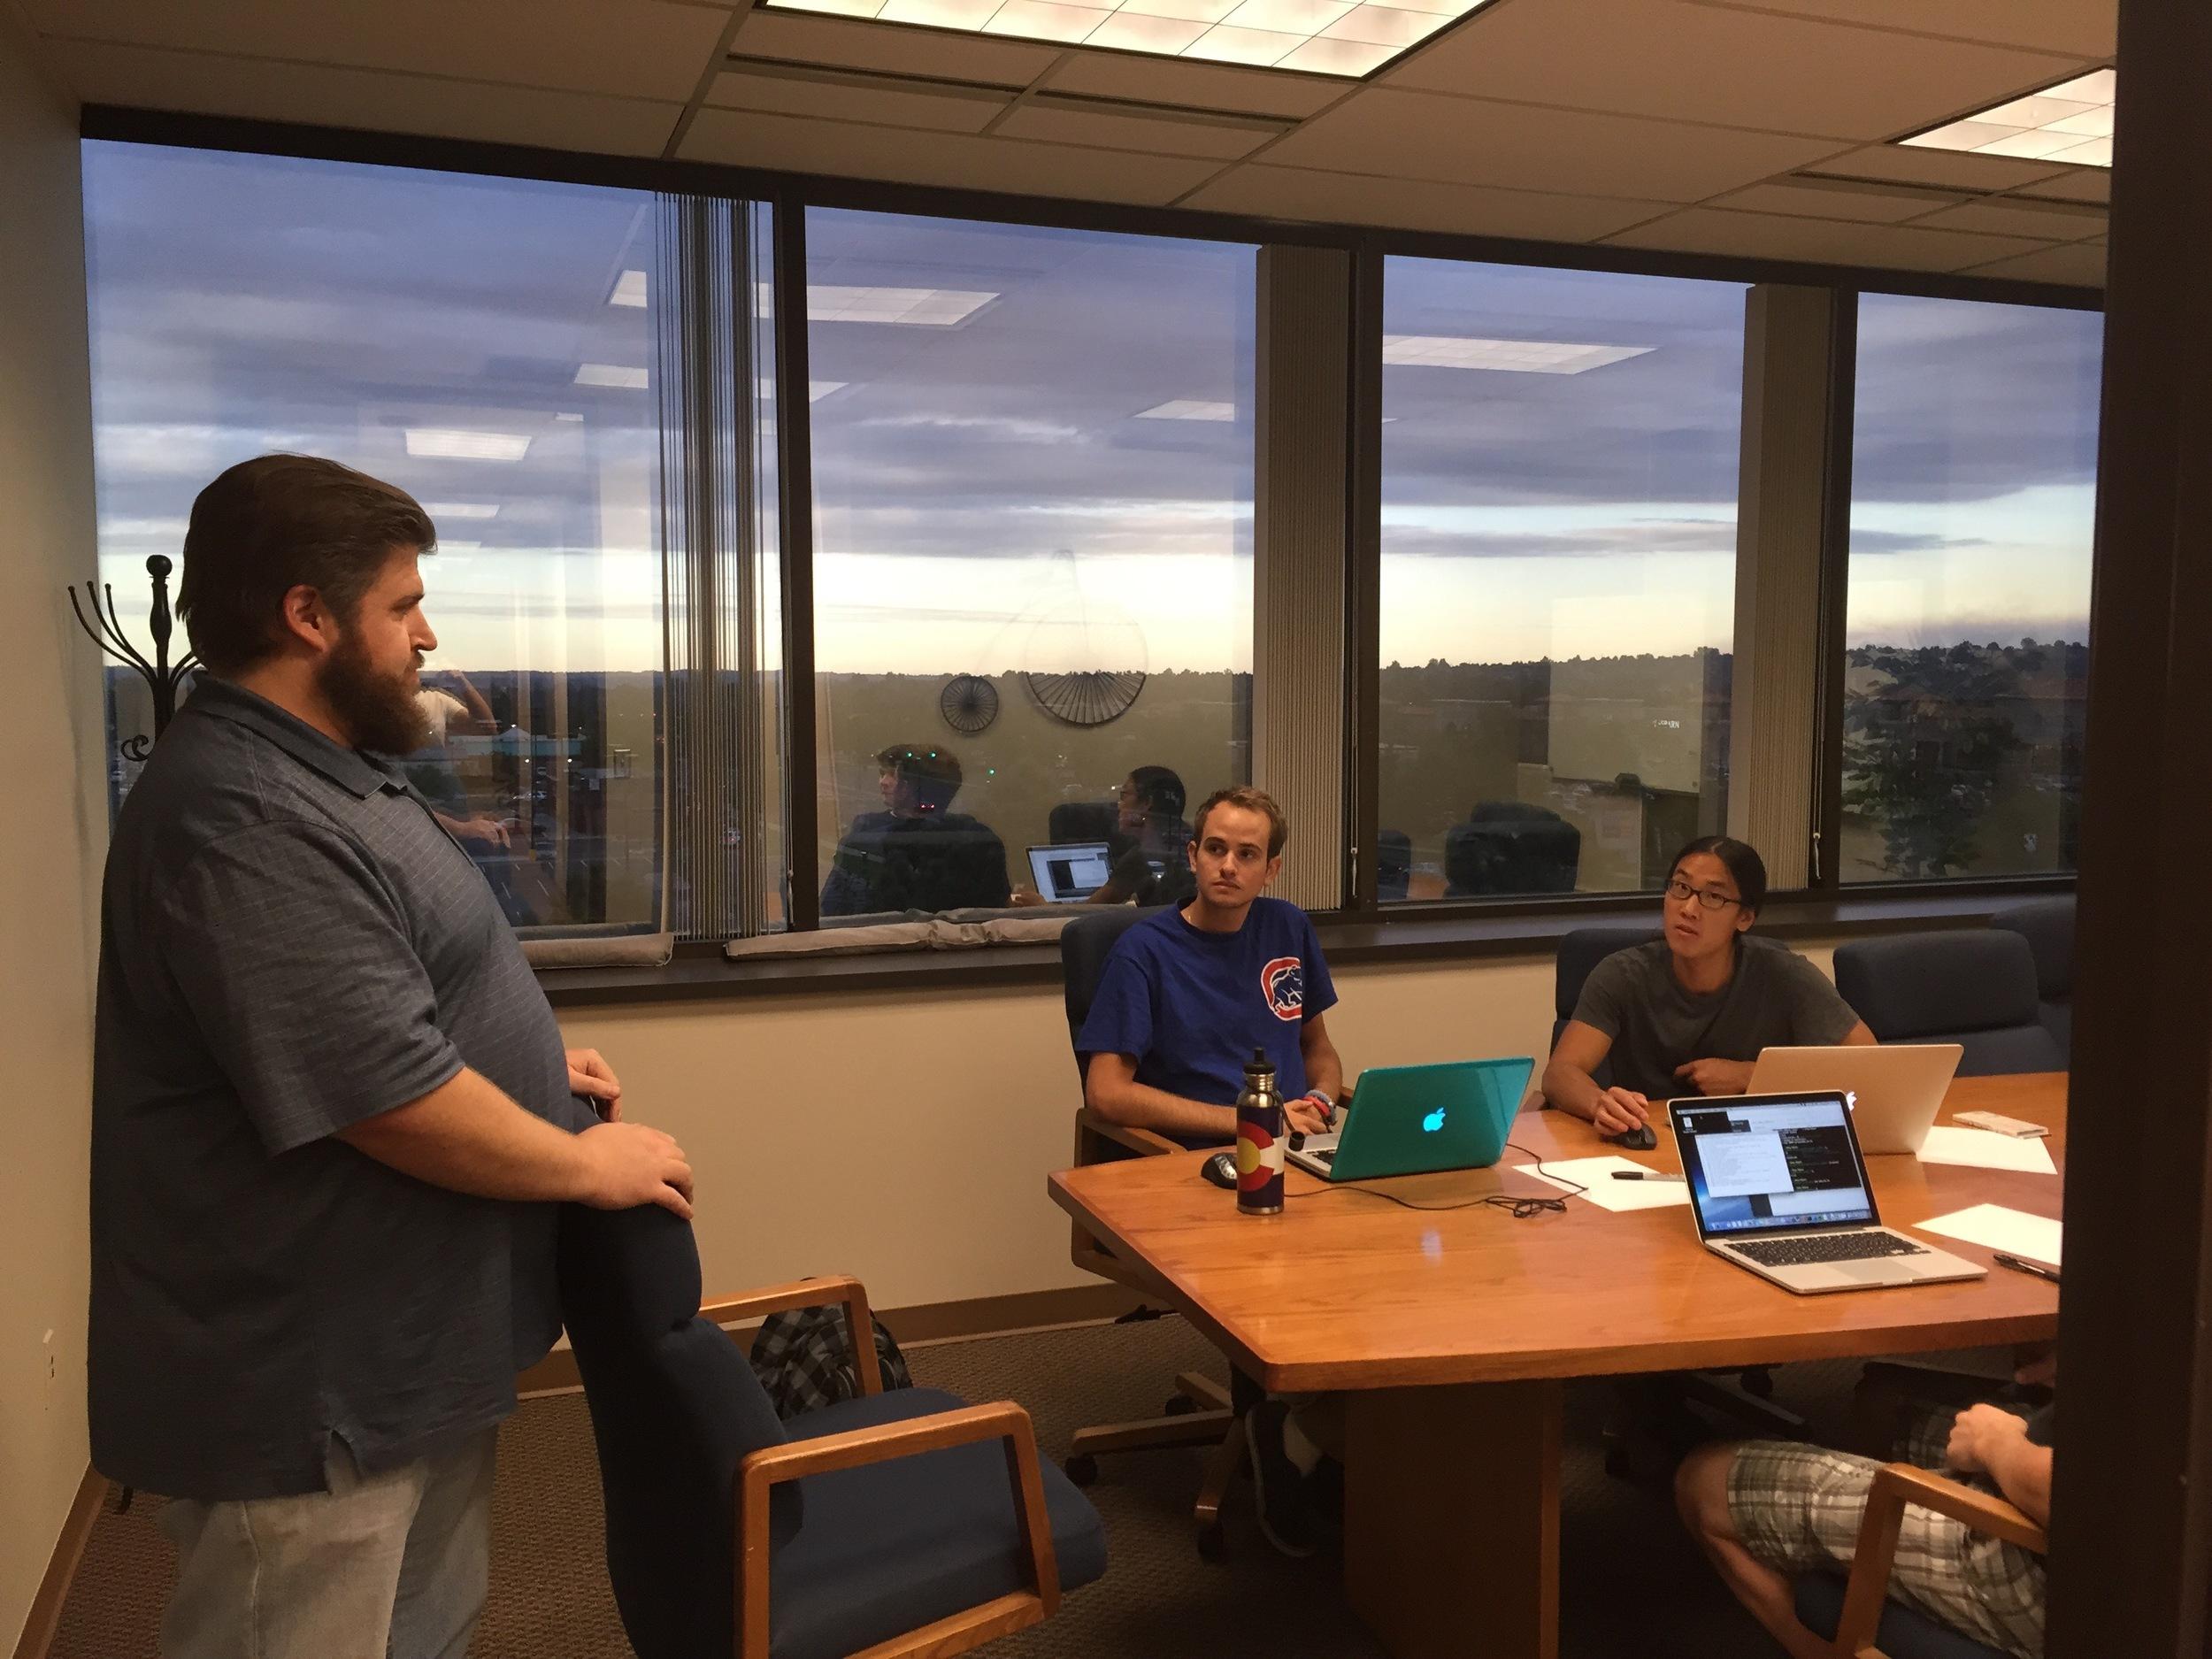 DaVinci Coders Senior Ruby on Rails Instructor, Jason Noble, advising a posse of student developers